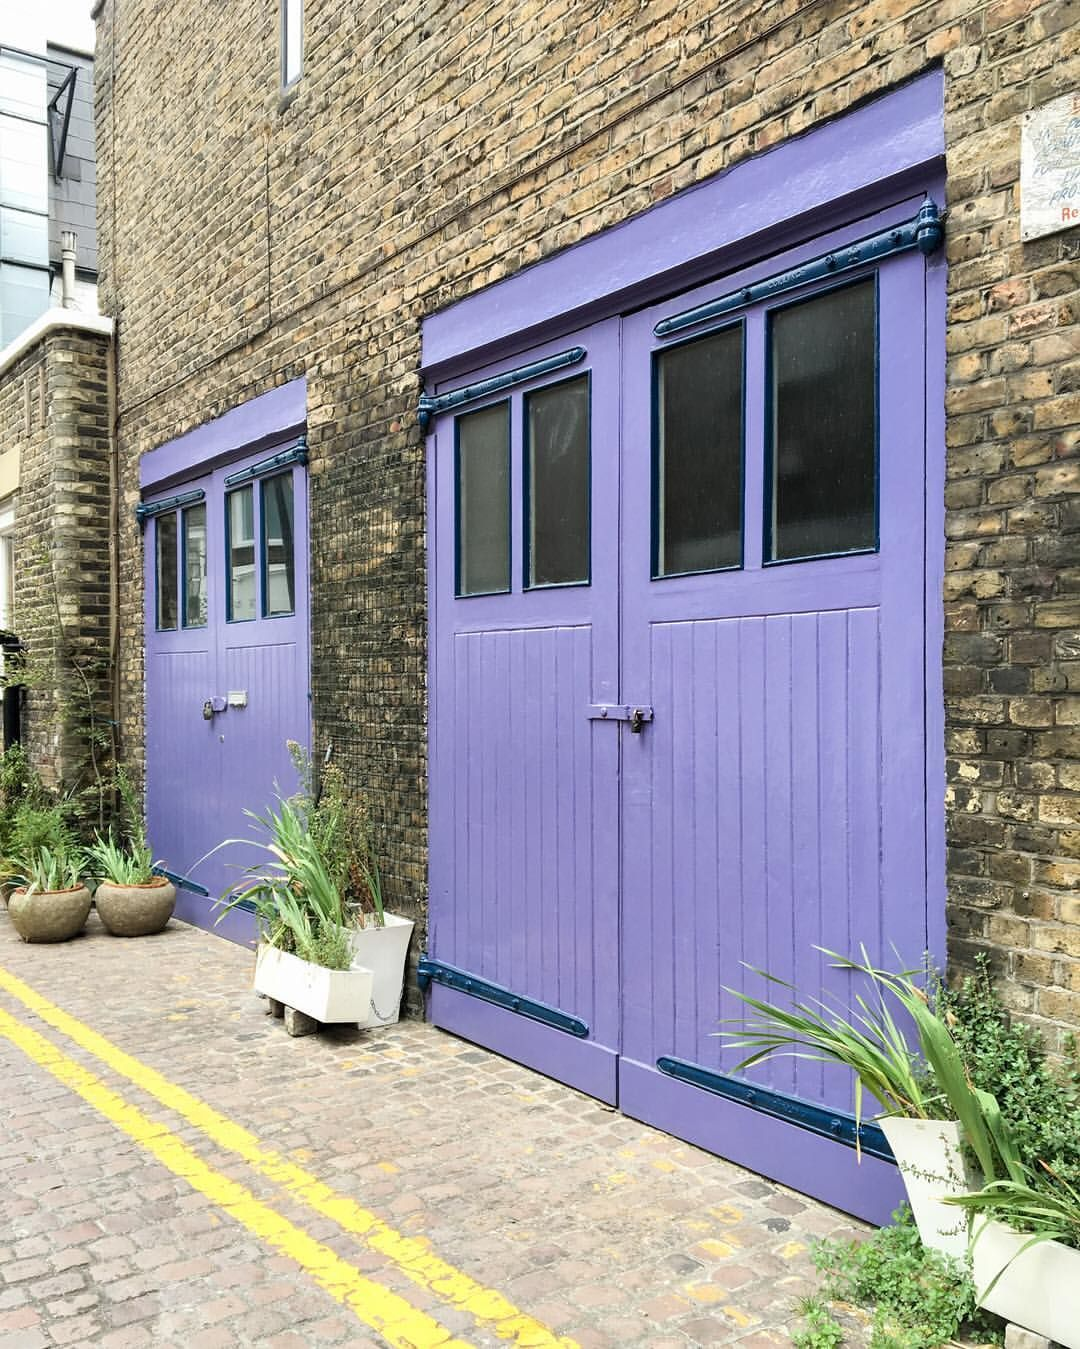 Lights The Garage London: Purple Garage Doors In A South Kensington Mews, London